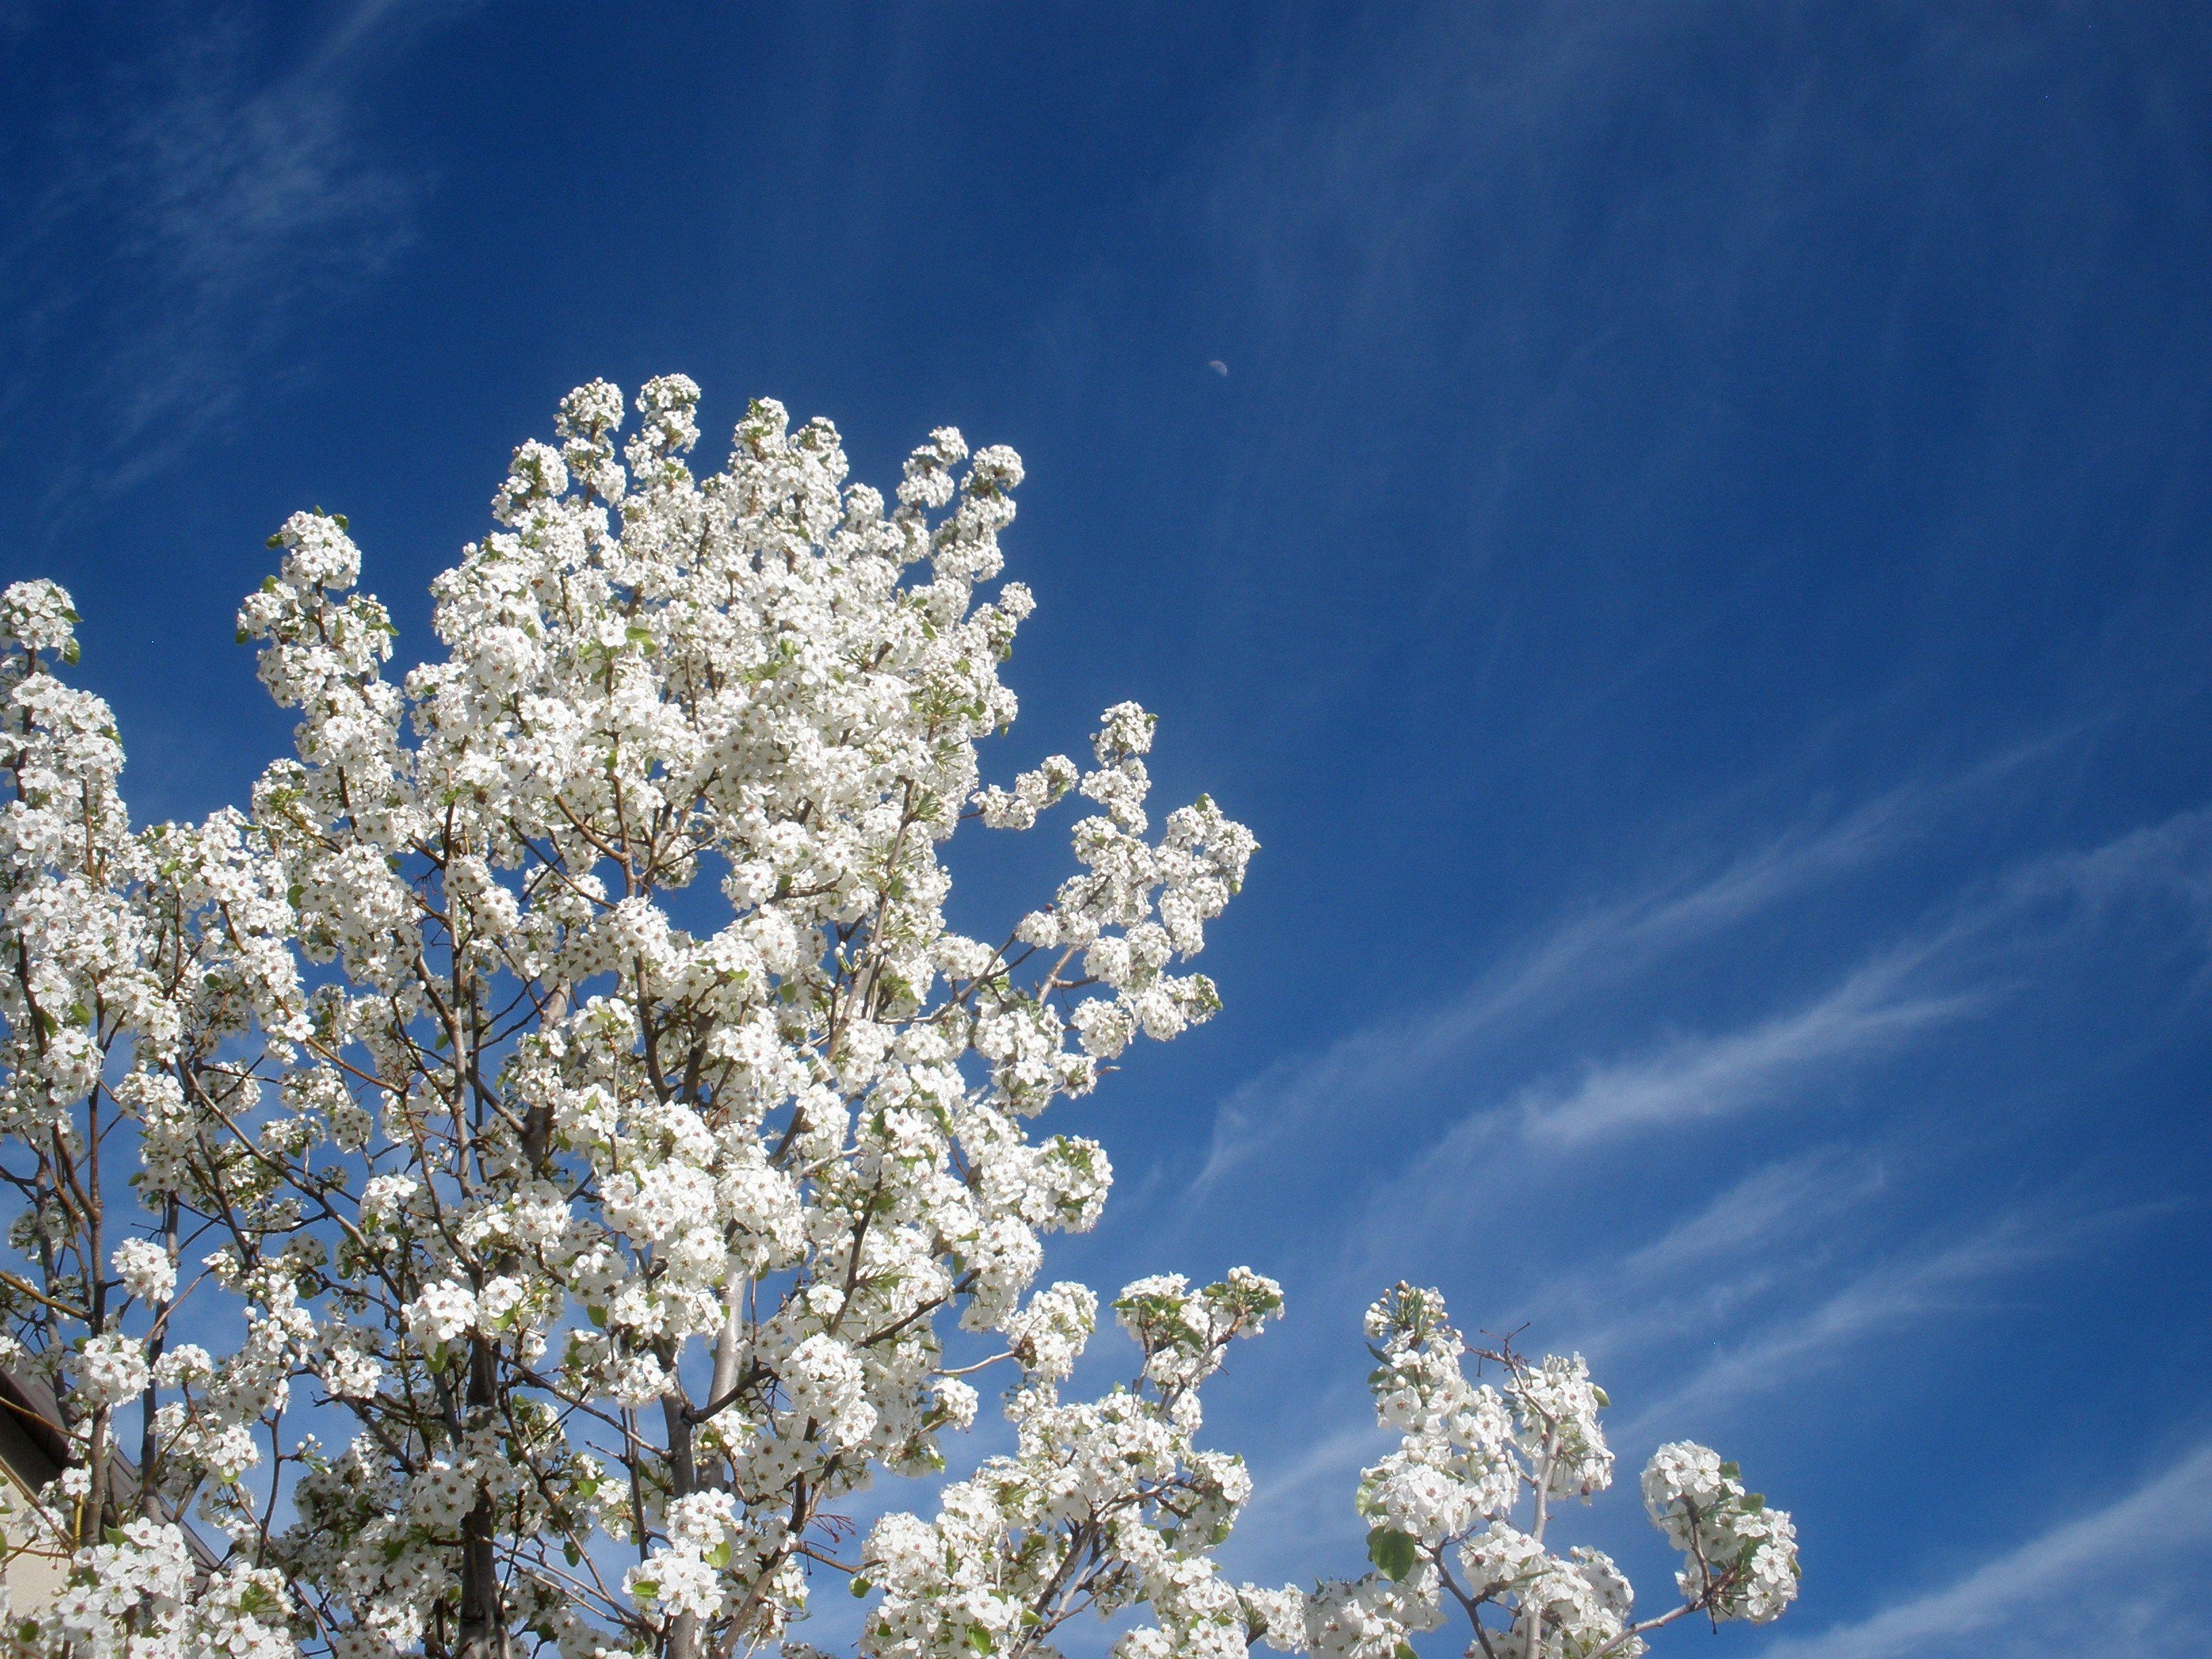 Blossomed Sky